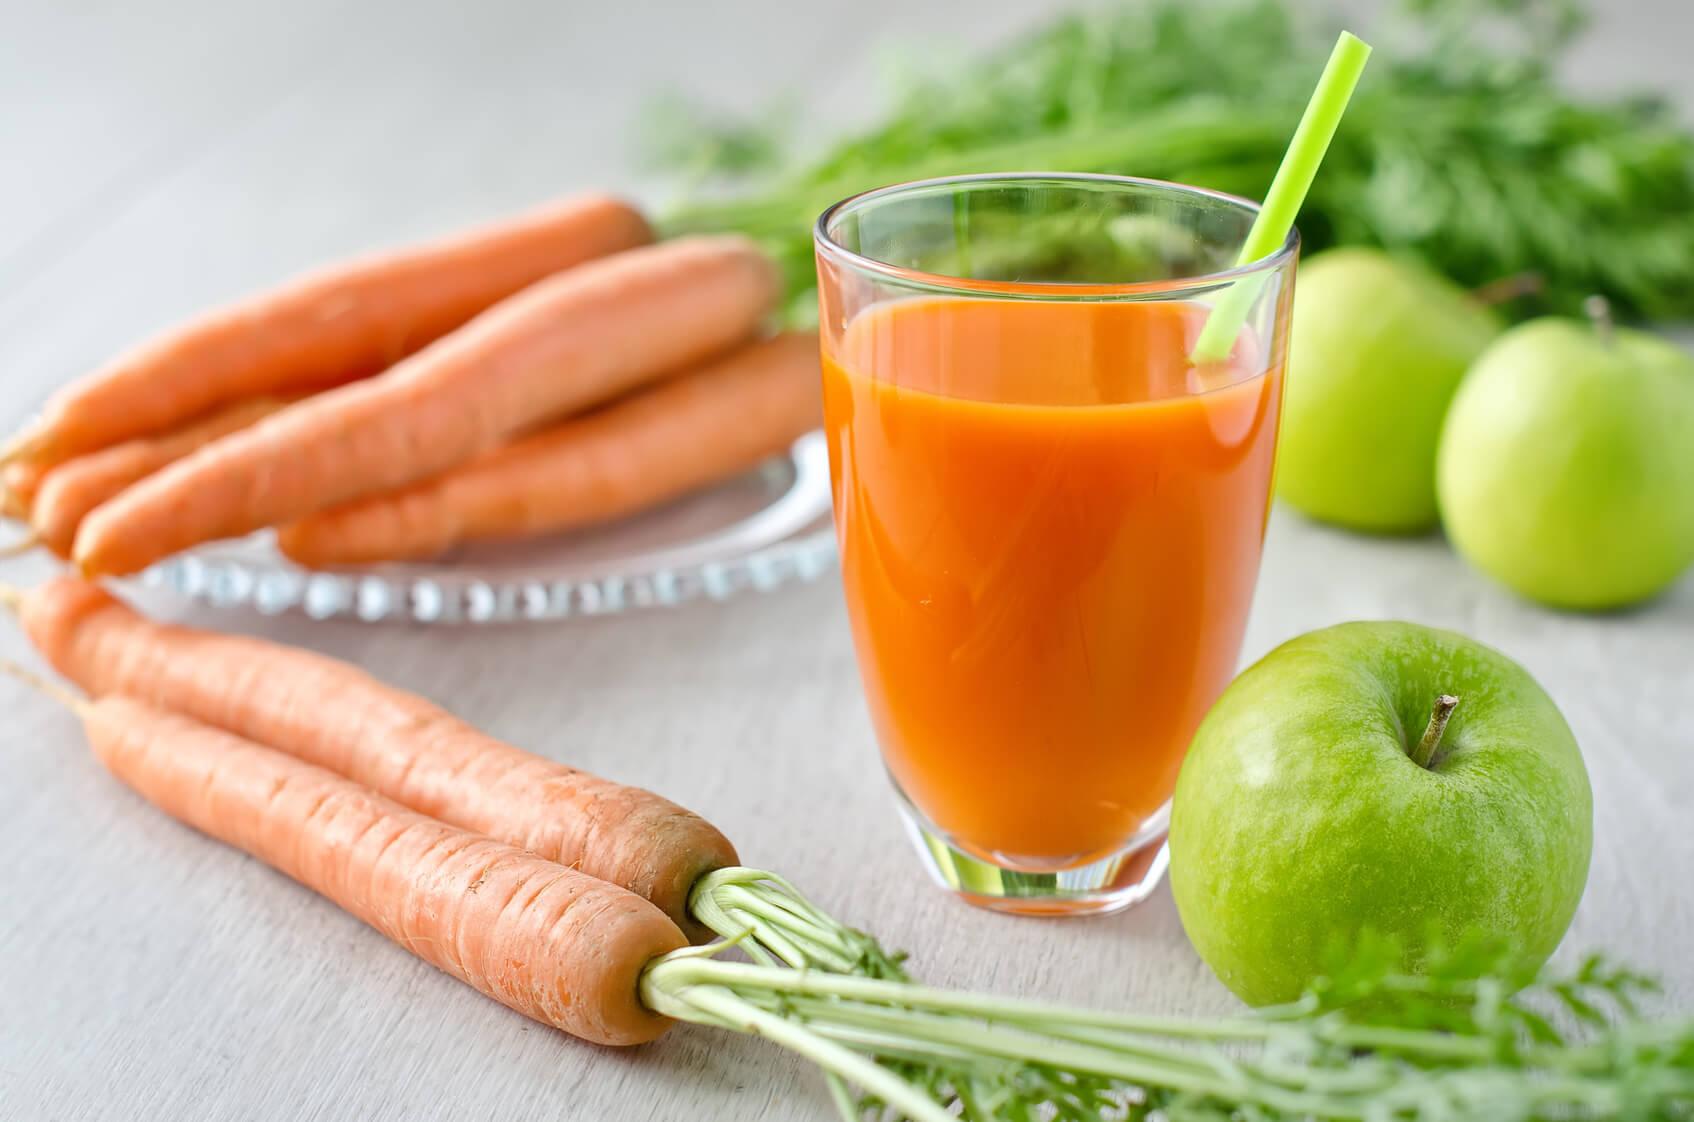 Fruttalo a base di carota e mela